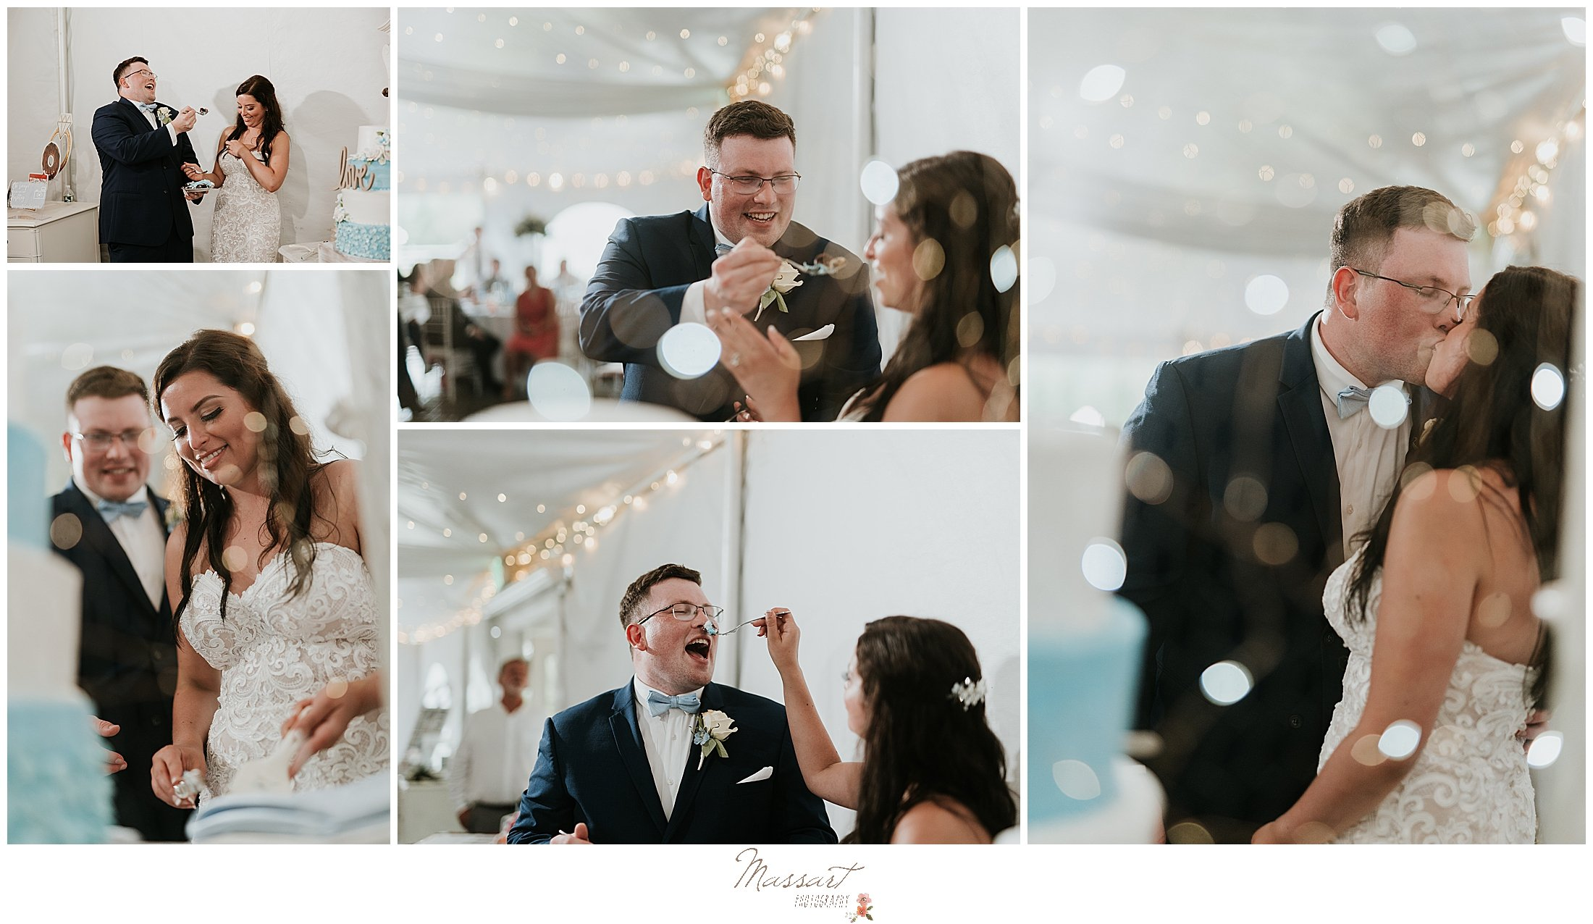 Rhode Island wedding cake cutting pictures